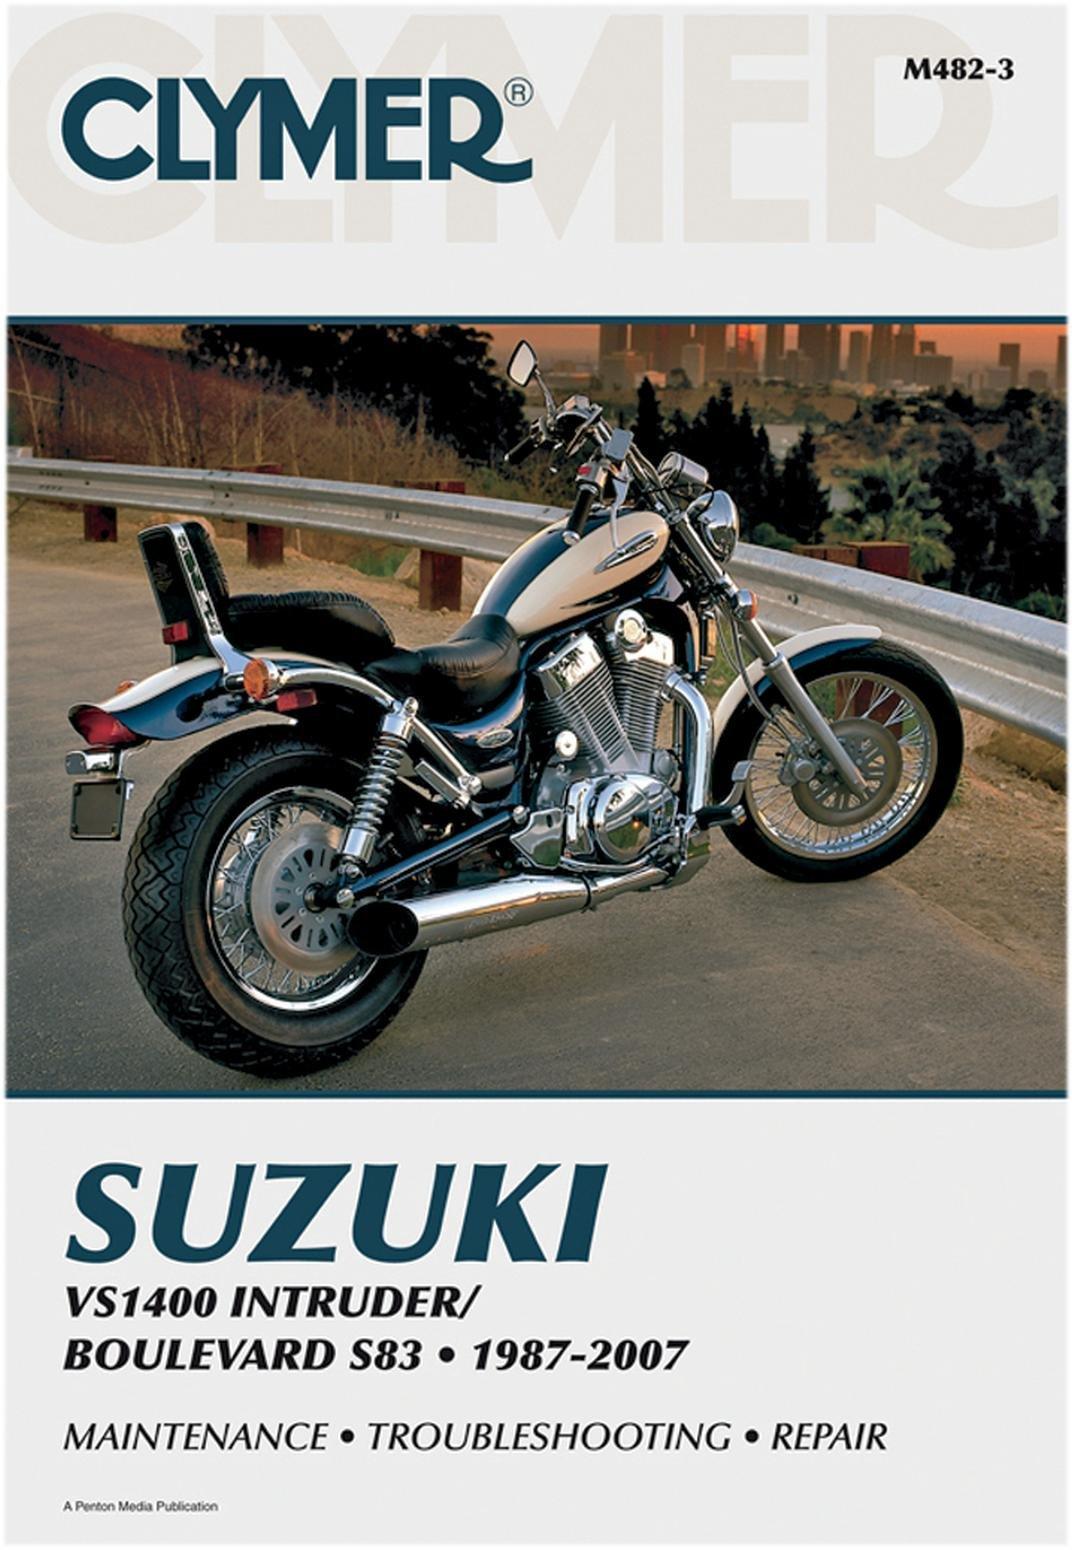 Clymer Repair Manual for Suzuki VS1400 Intruder 87-07